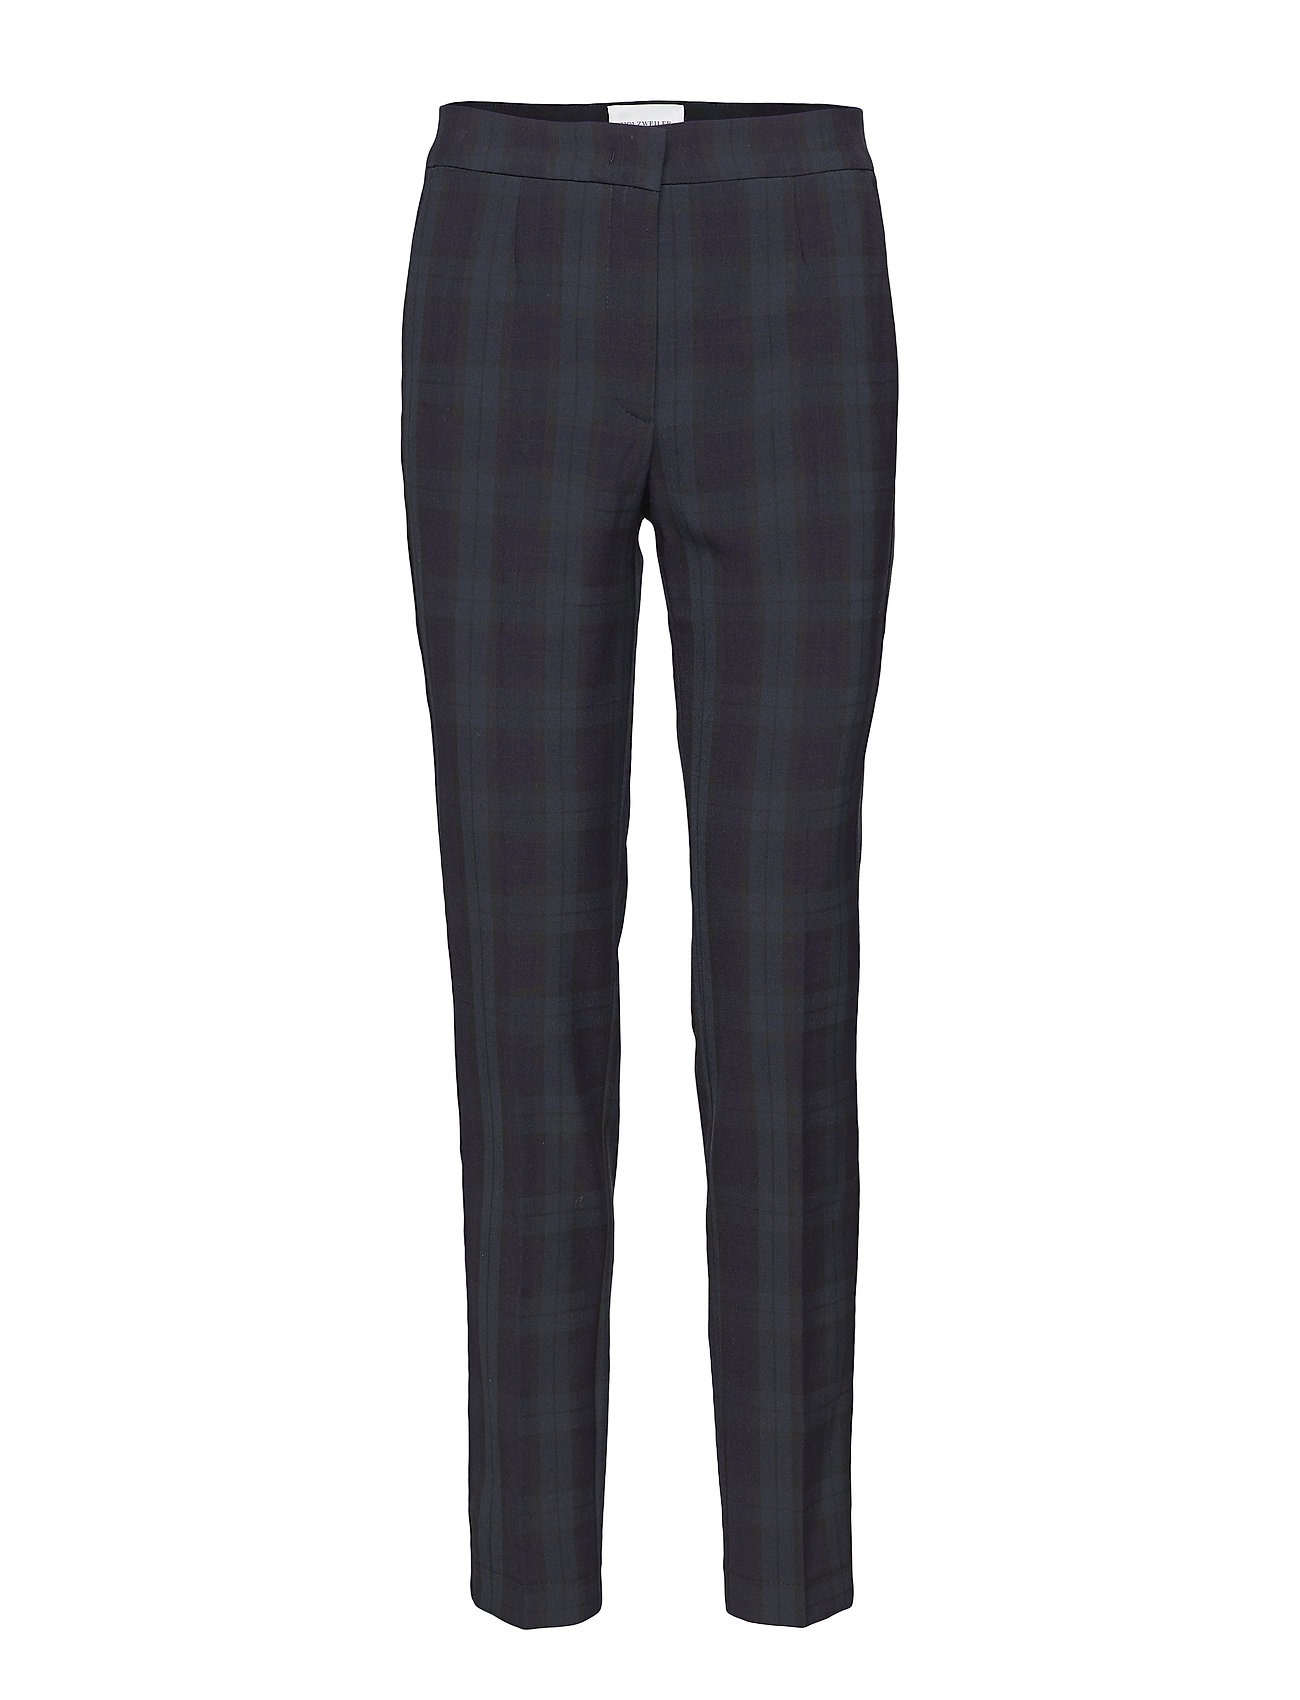 HOLZWEILER OVEDIA Trousers - BLACK CHECK